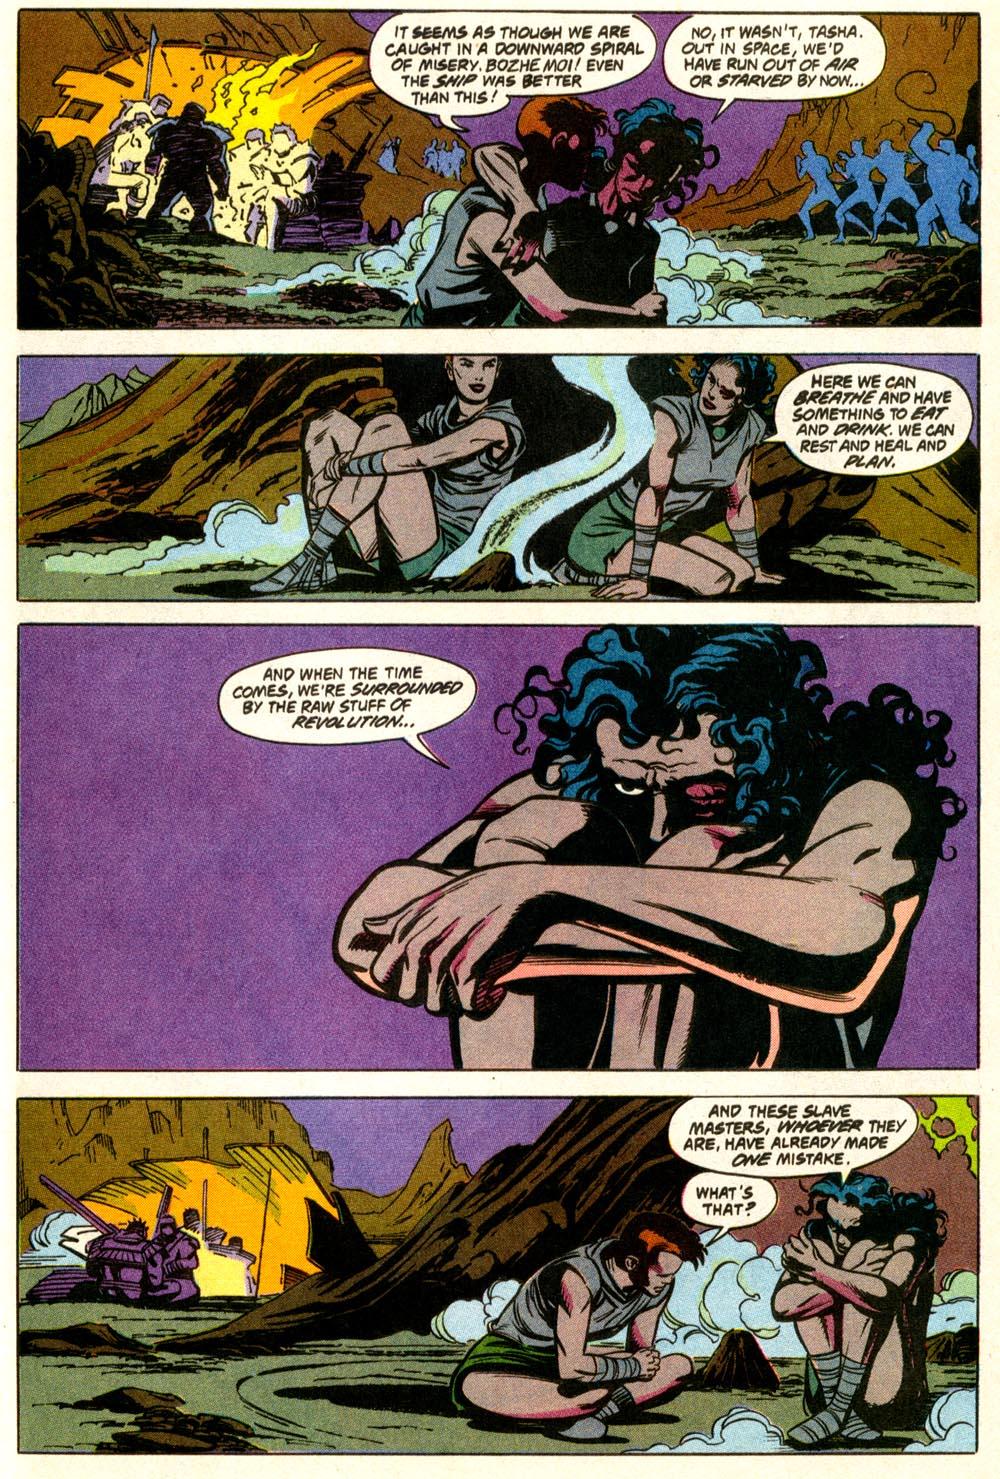 Read online Wonder Woman (1987) comic -  Issue #67 - 22